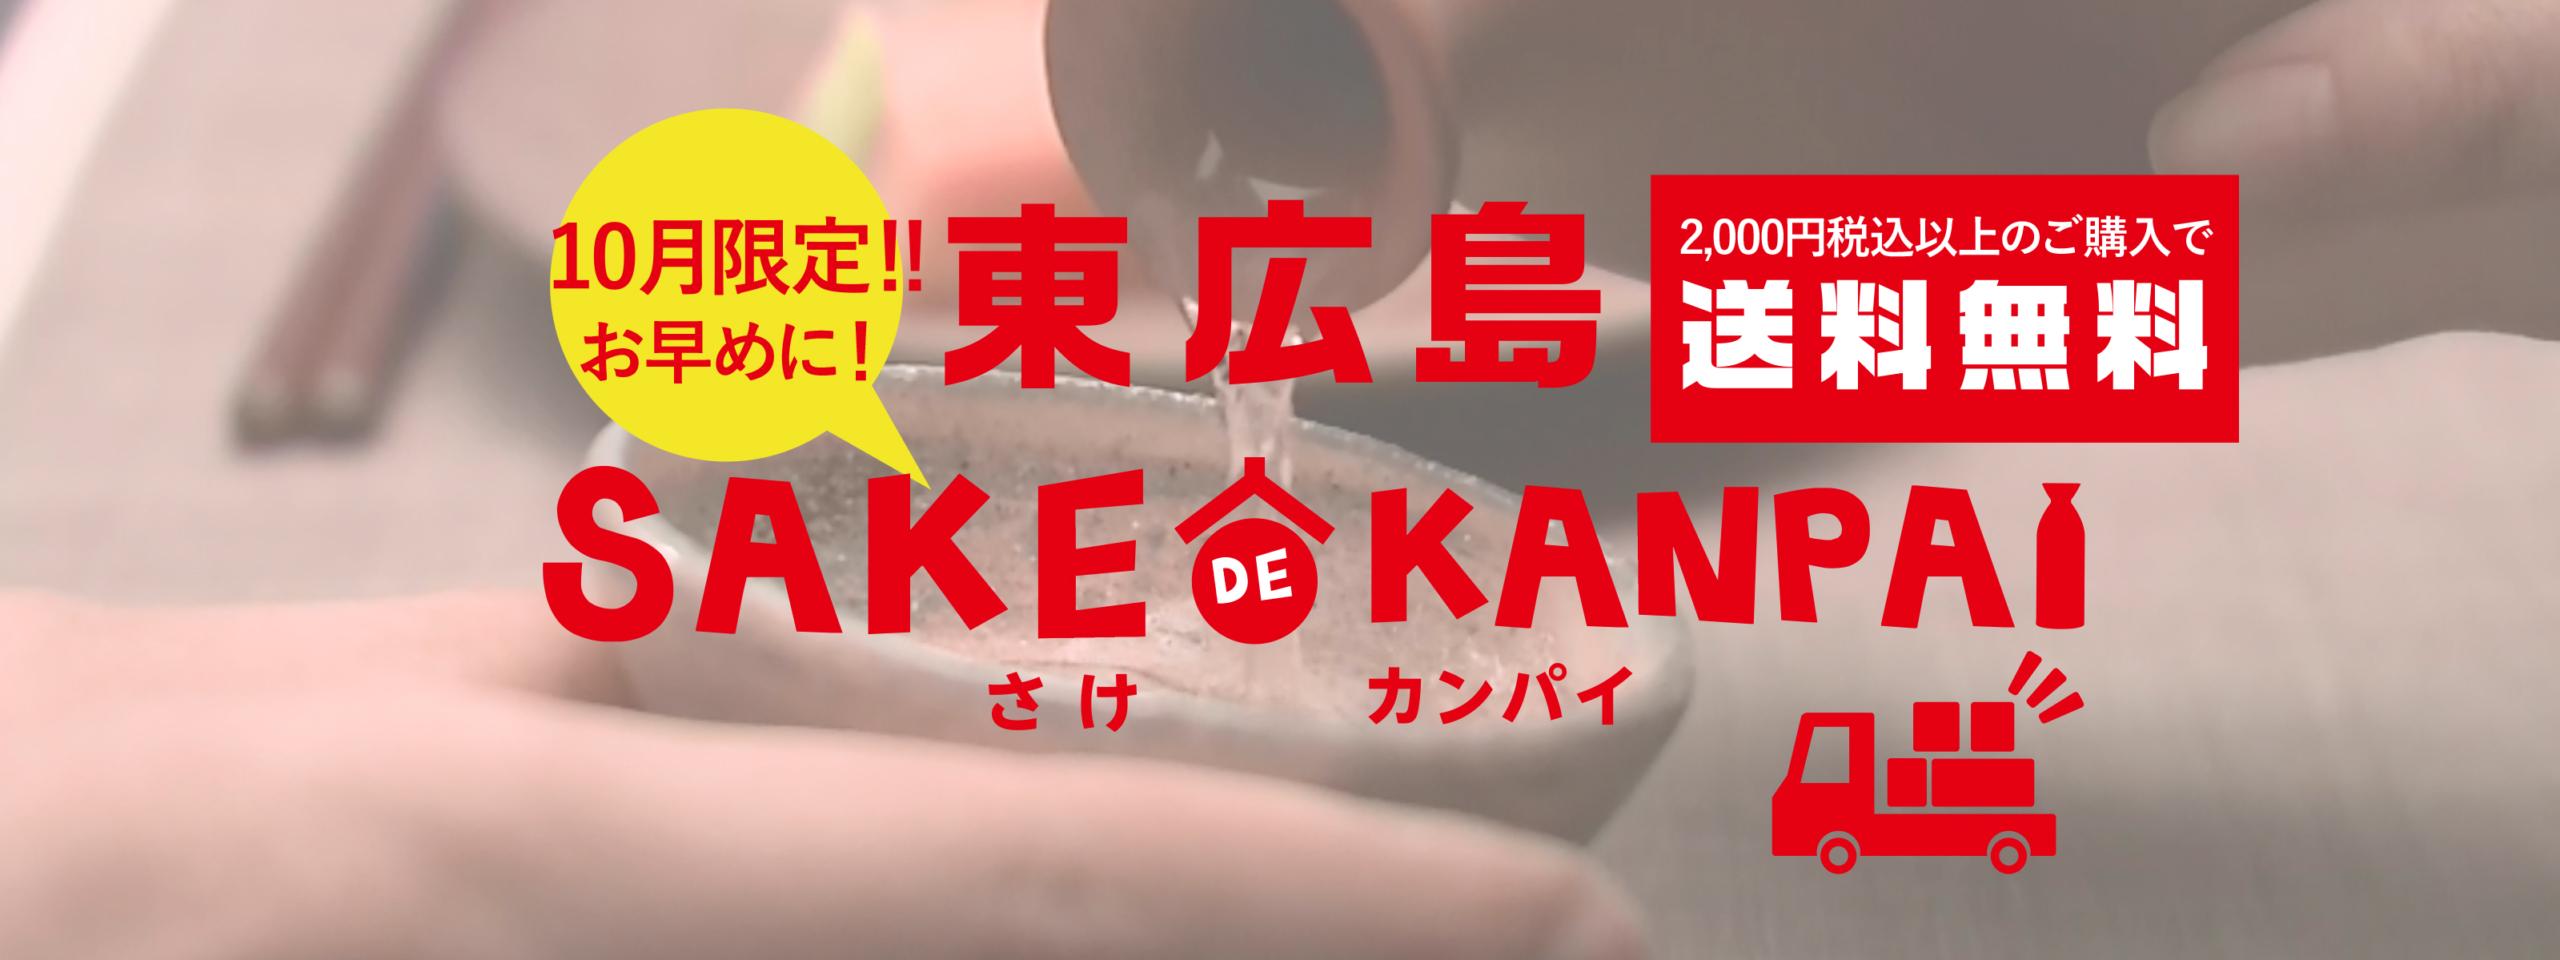 東広島SAKE de KANPAI